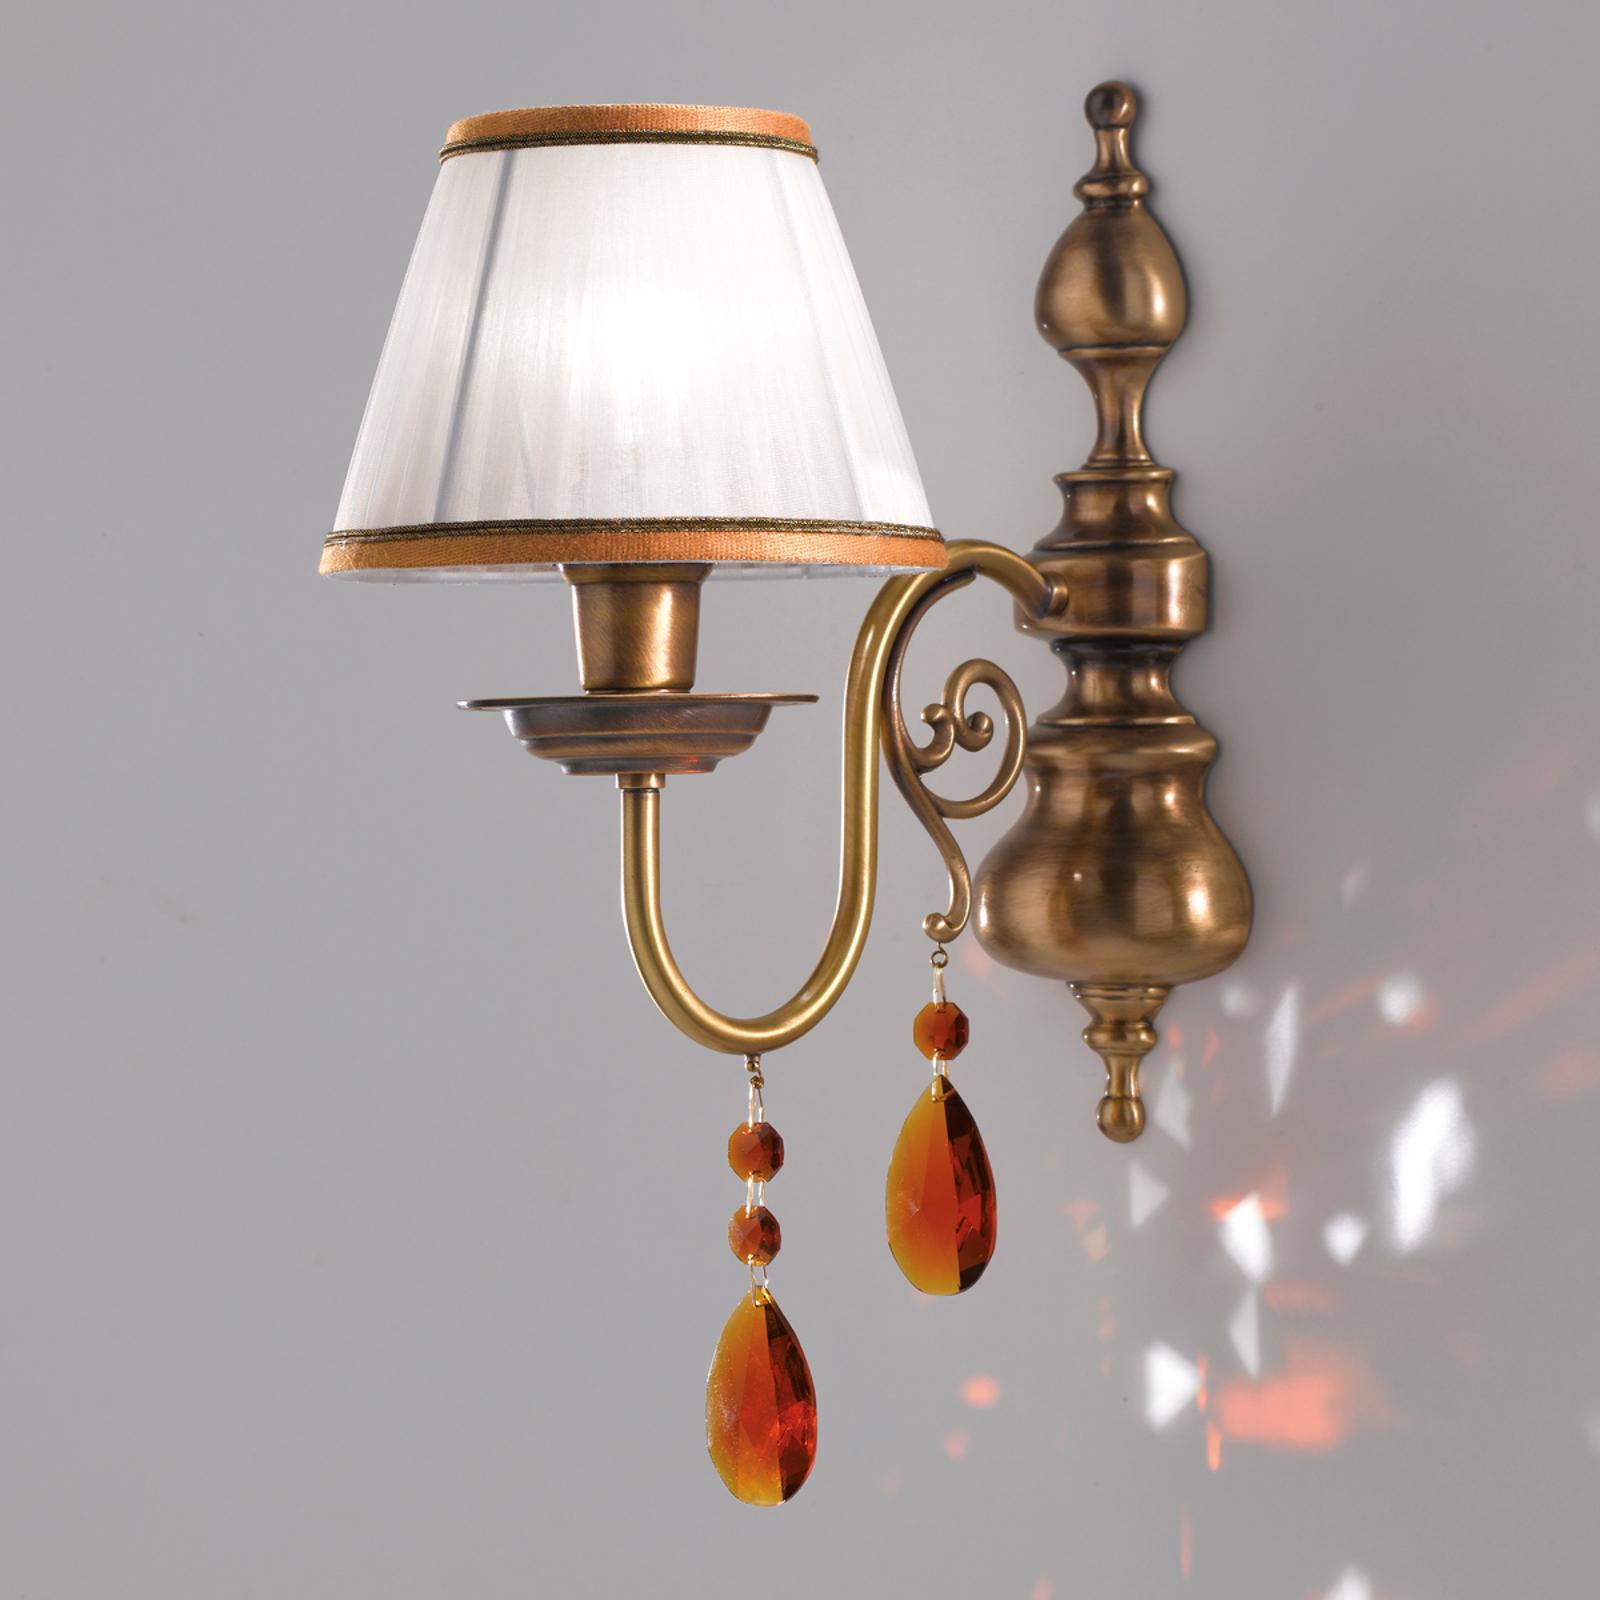 Crystal - rijk gedecoreerde textiele wandlamp